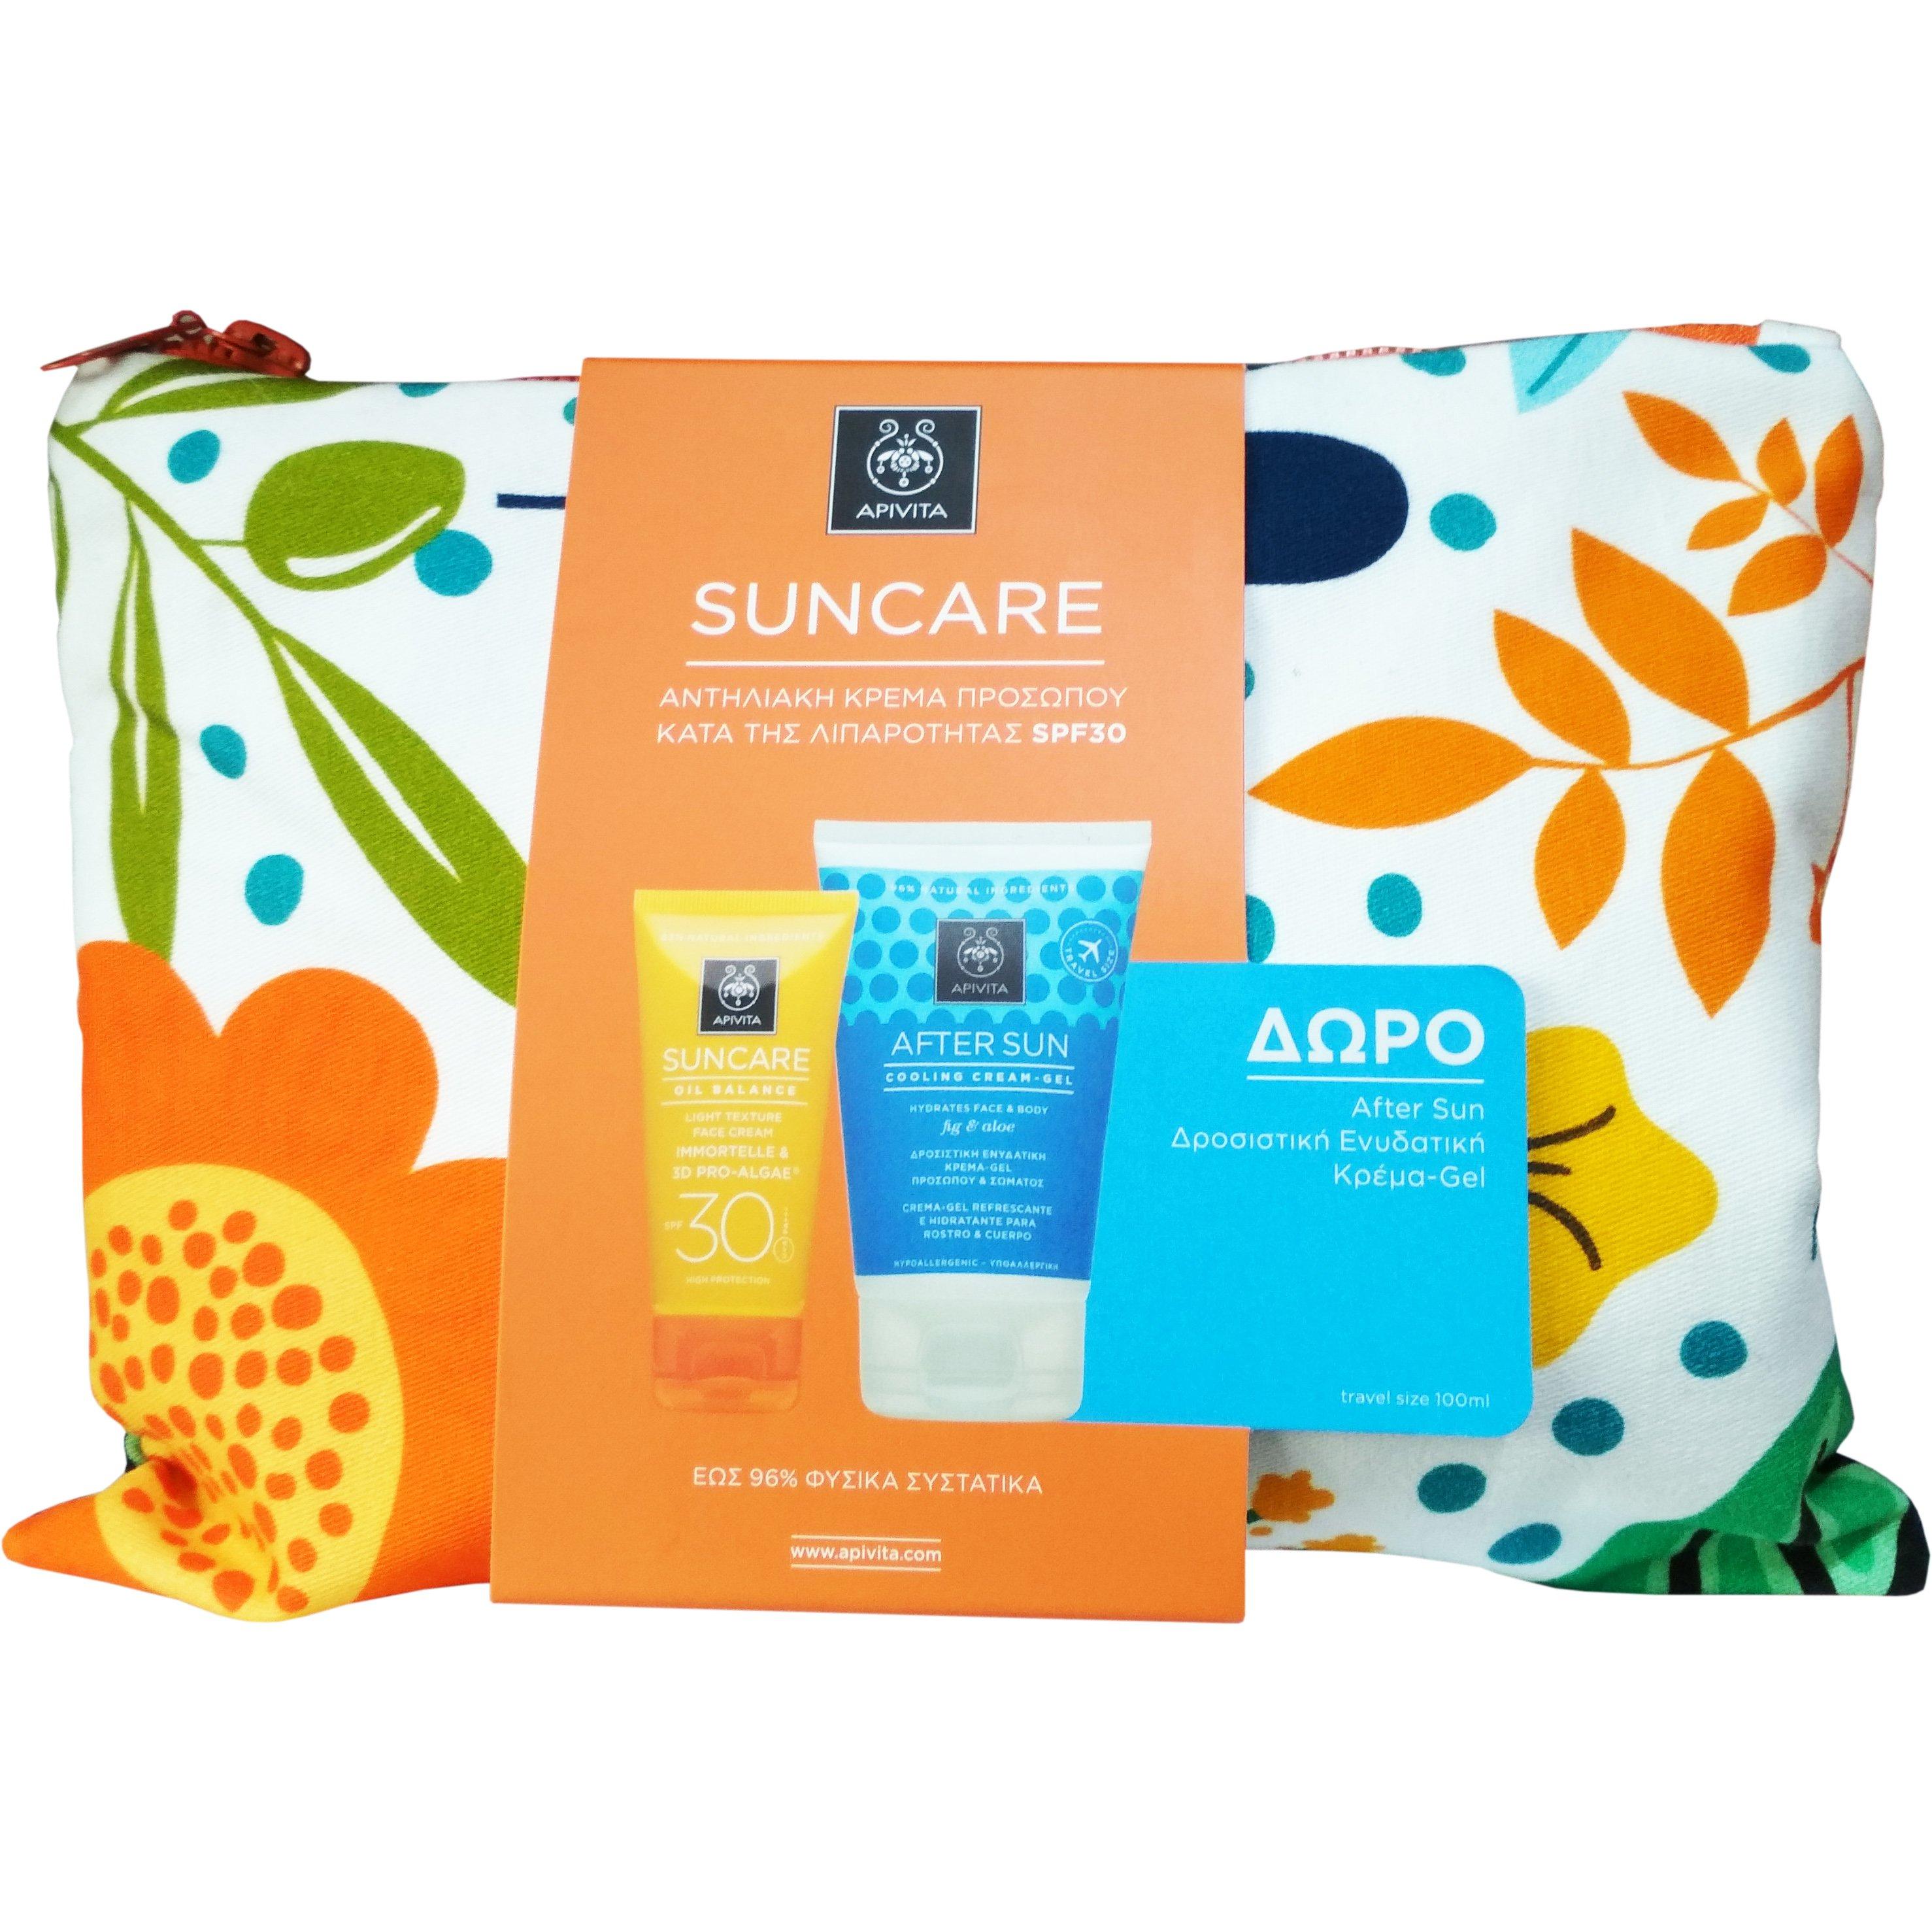 Apivita Πακέτο Προσφοράς Suncare Oil Balance Light Face Cream Spf30, 50ml & Δώρο αντηλιακά   αντηλιακά προσώπου   αντηλιακή προστασία κατά της ακμής   λιπαρότητα